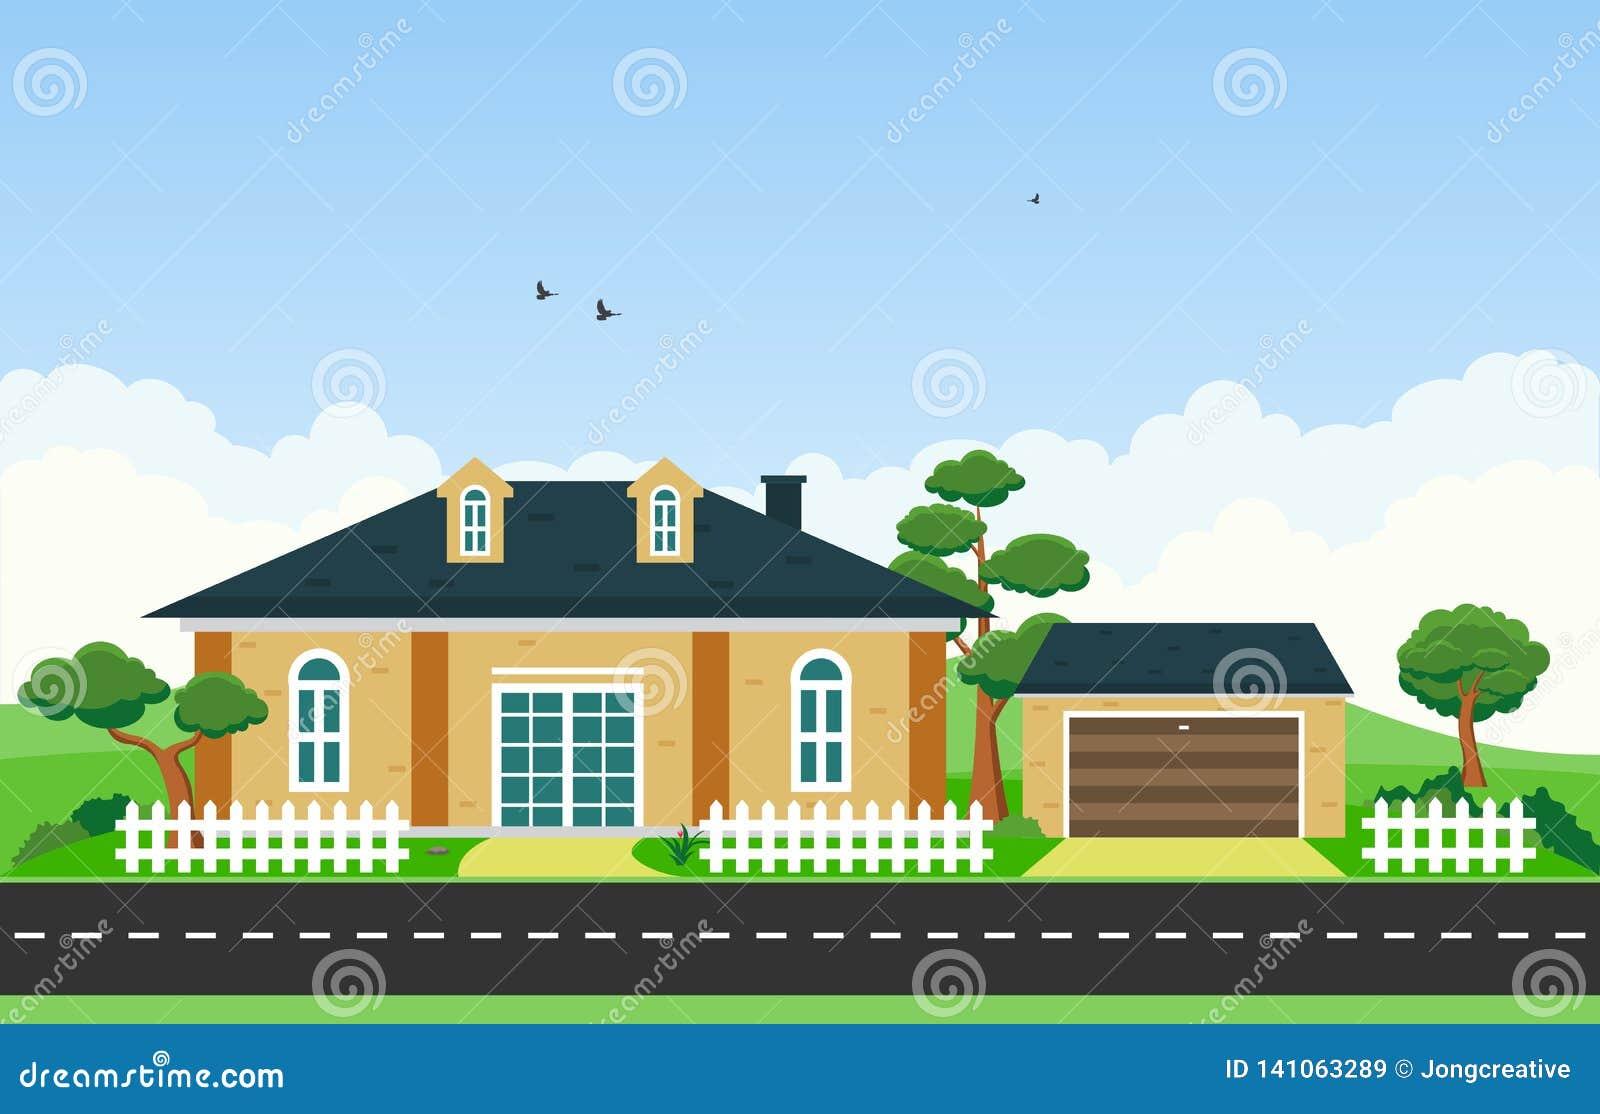 Beautiful Modern House Exterior Facade Yard Residential Illustration